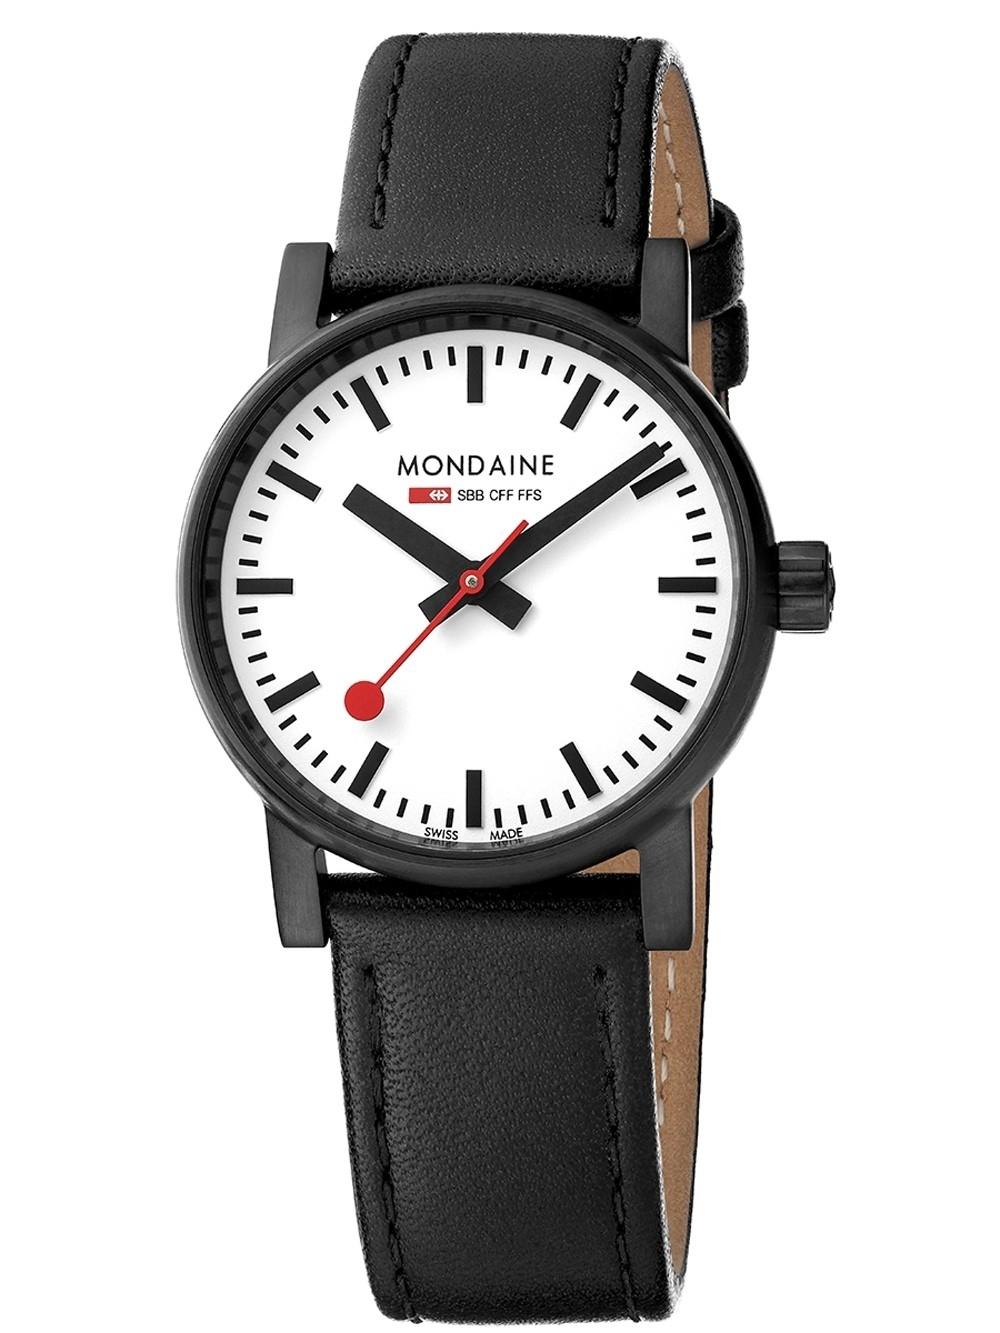 Watches Chrono12 Mondaine Mse 30111 Lb Evo2 Damen 30mm